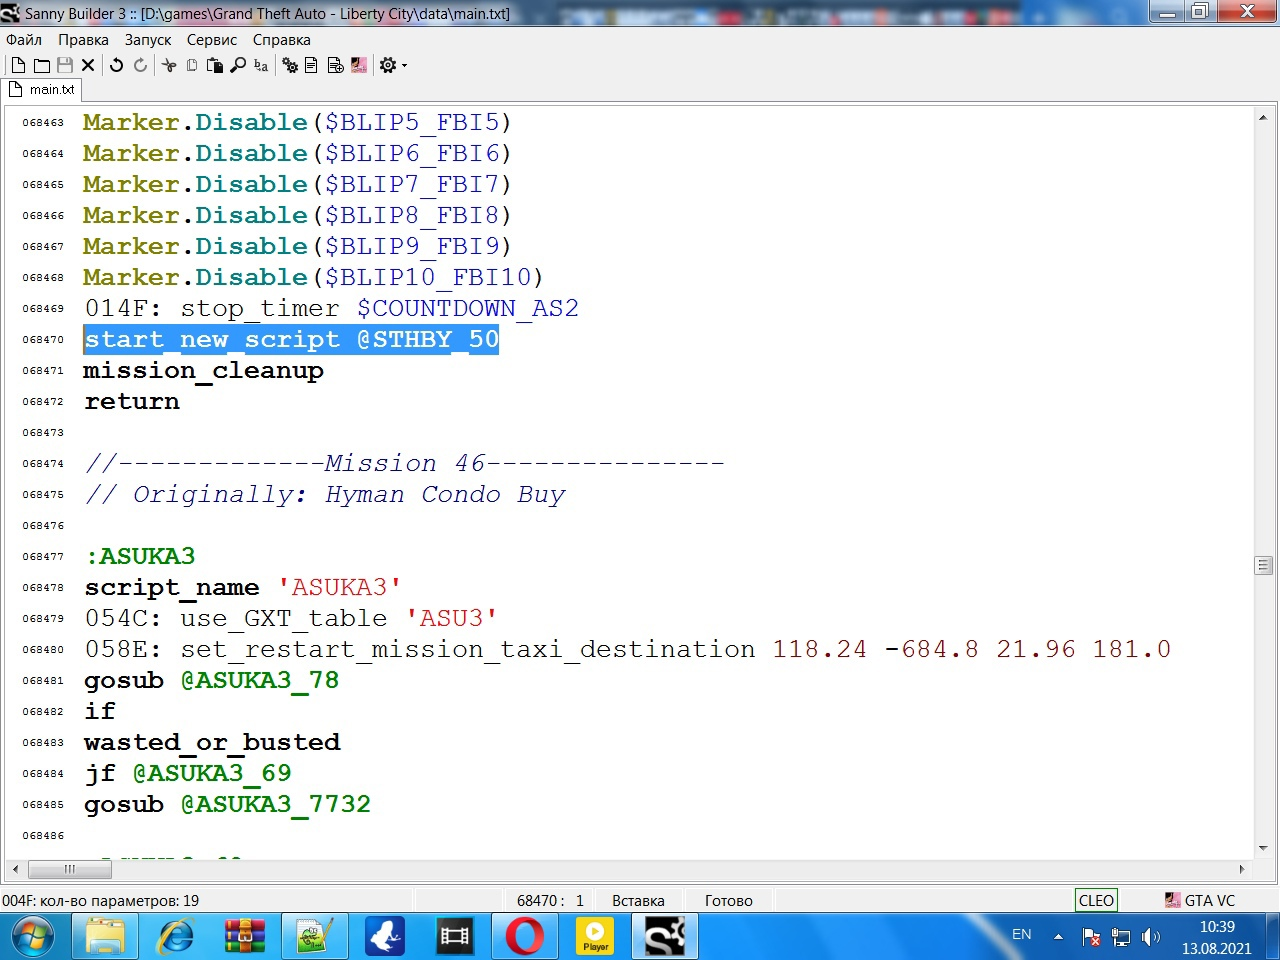 PAEV_d_iNy4.jpg?size=1280x960&quality=96&sign=3eeef36d5cd0ee1203b7bbda4b5c4b0b&type=album